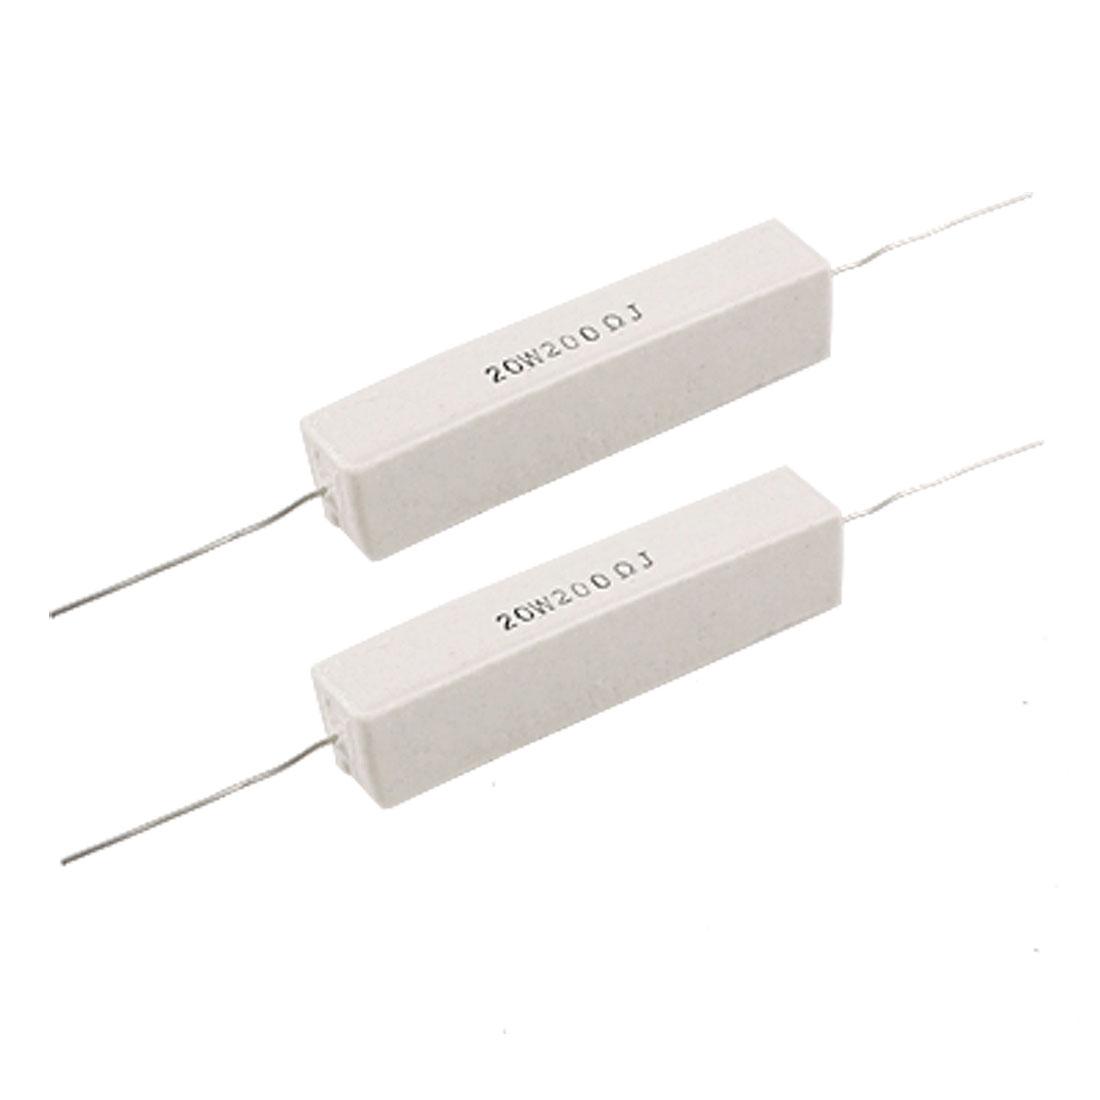 2 Pcs Axial Lead Ceramic Cement Resistor 200 Ohm 20W 5%